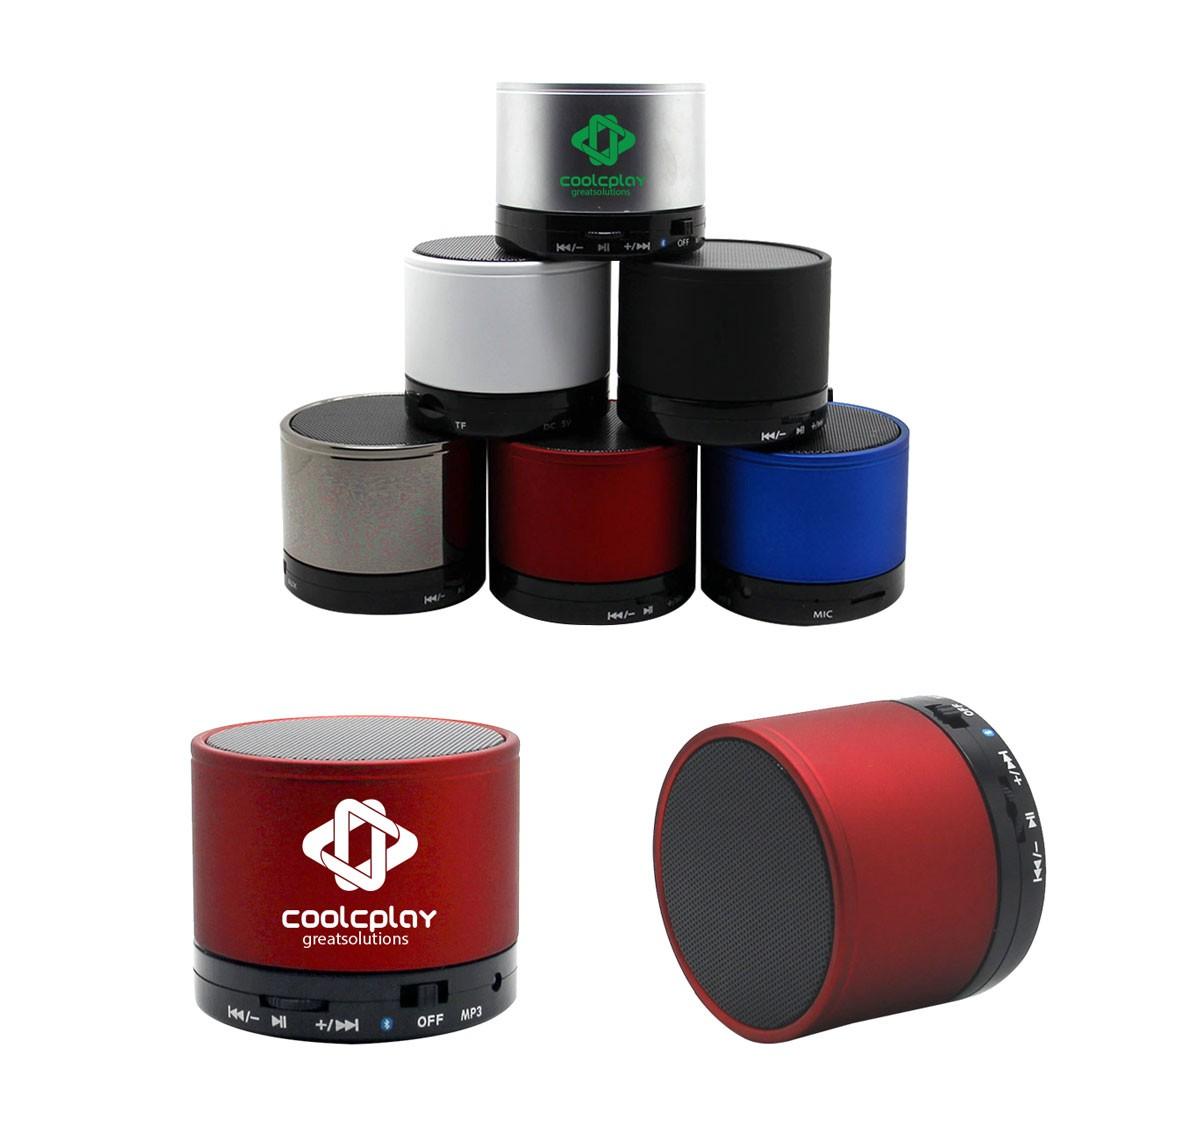 Stainless Steel Bluetooth Speaker